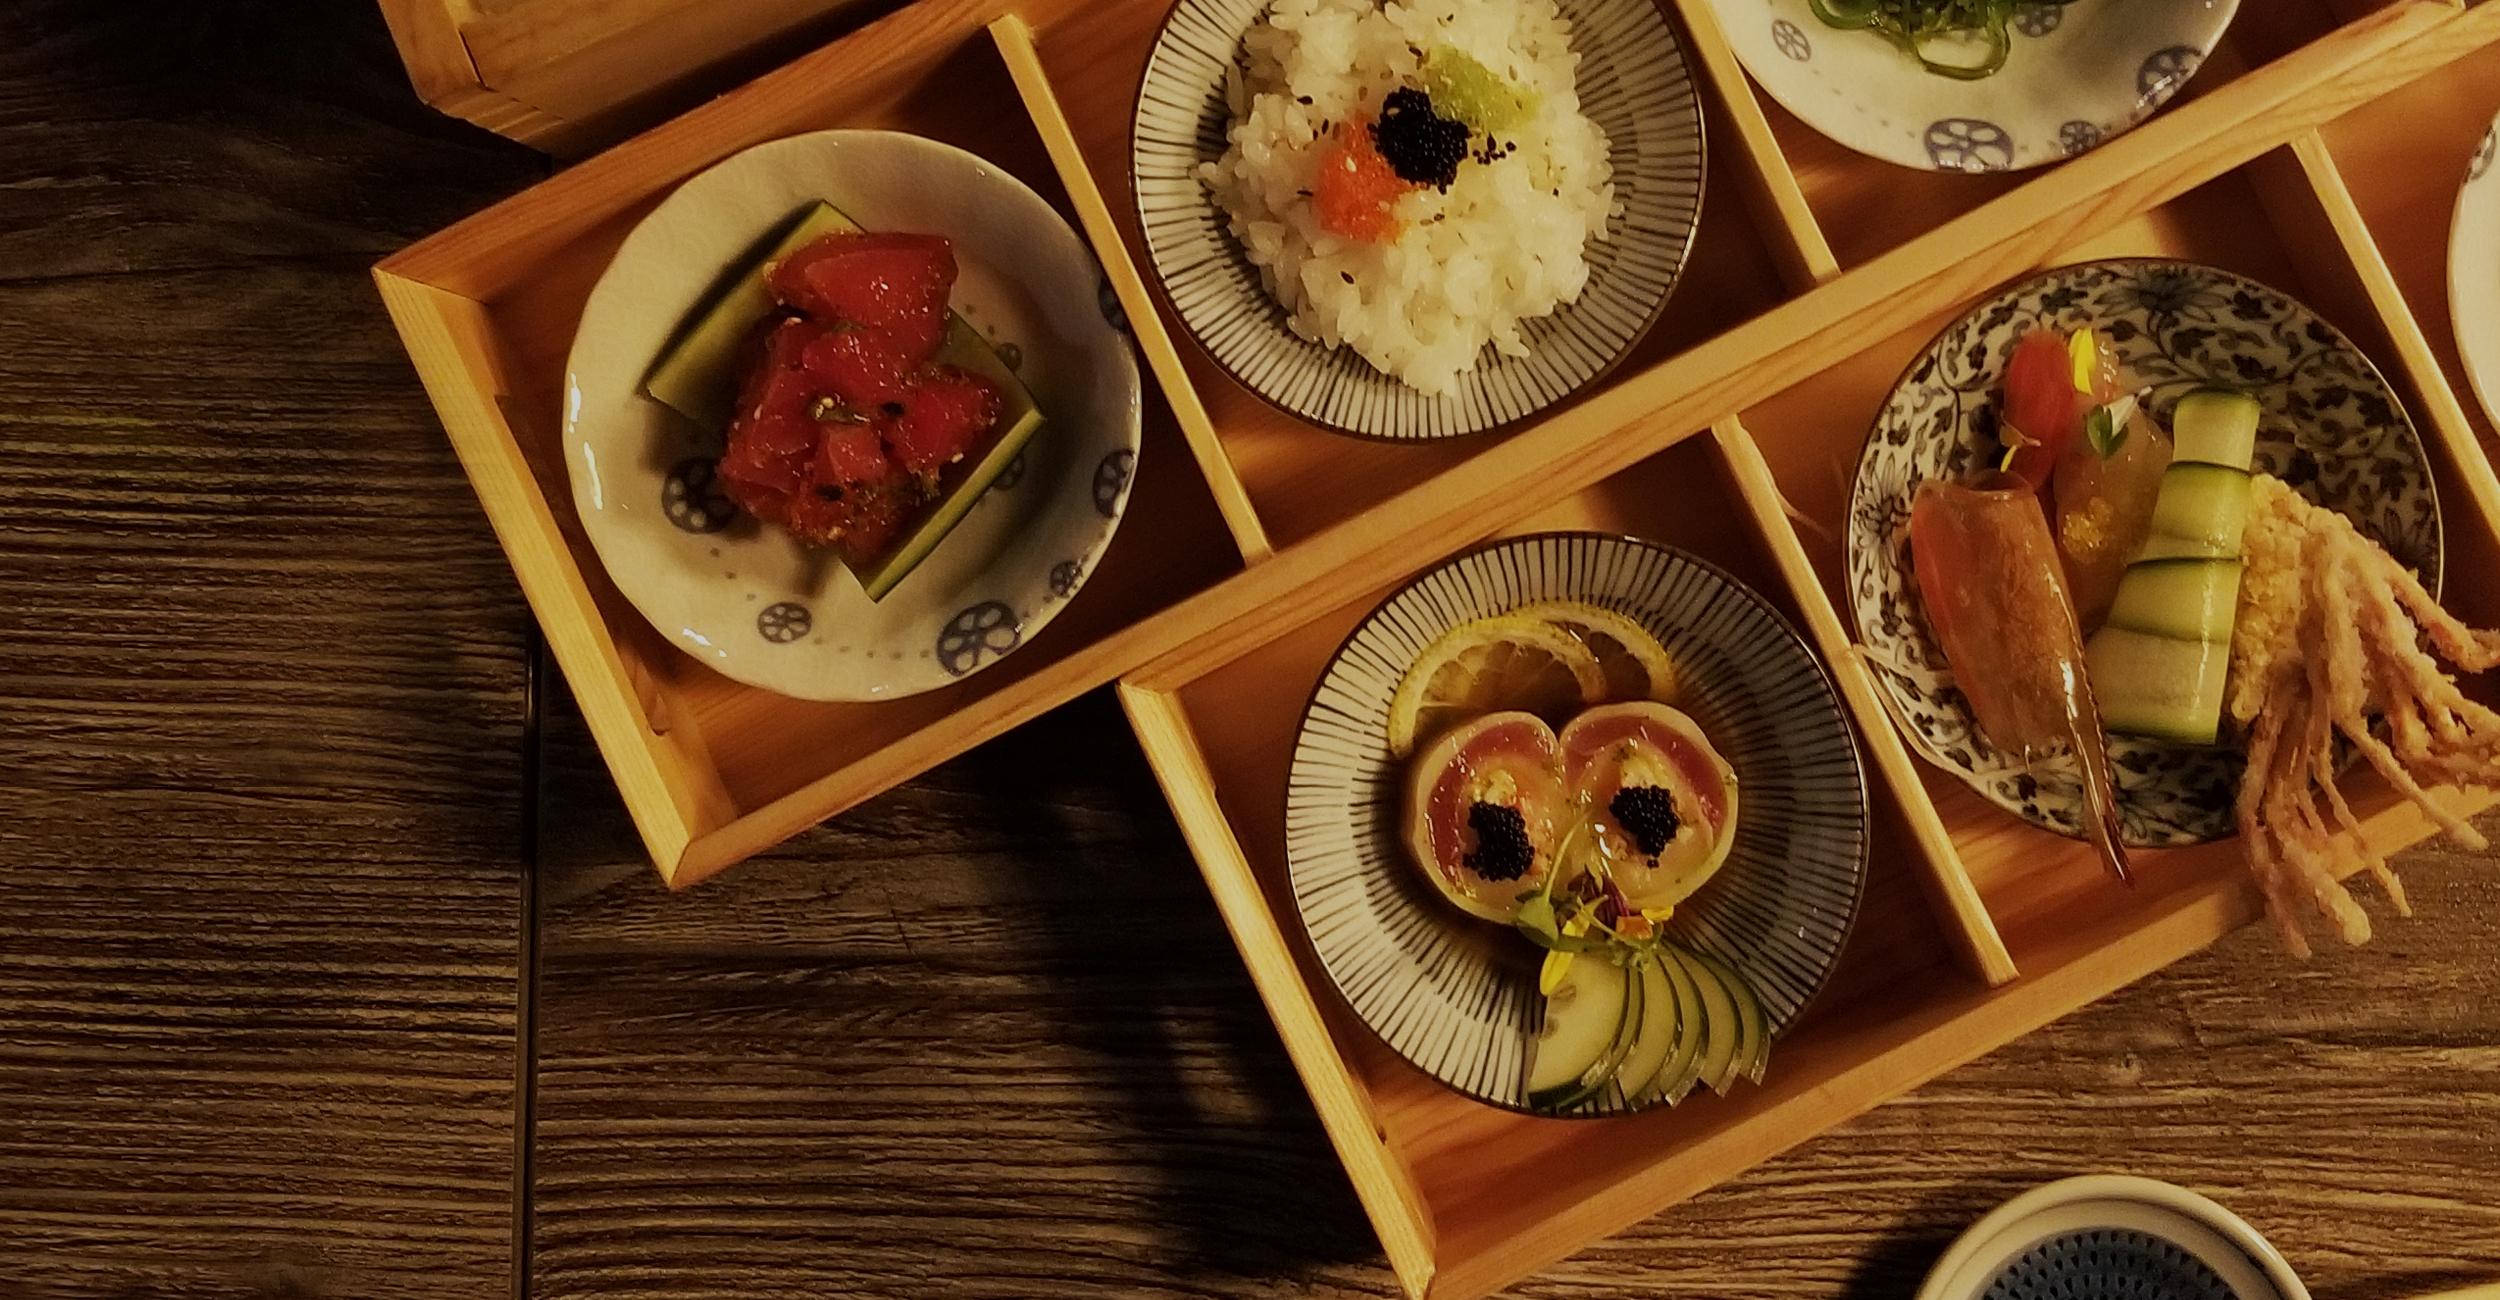 SASA Sushi Restaurant located in Dallas, Texas